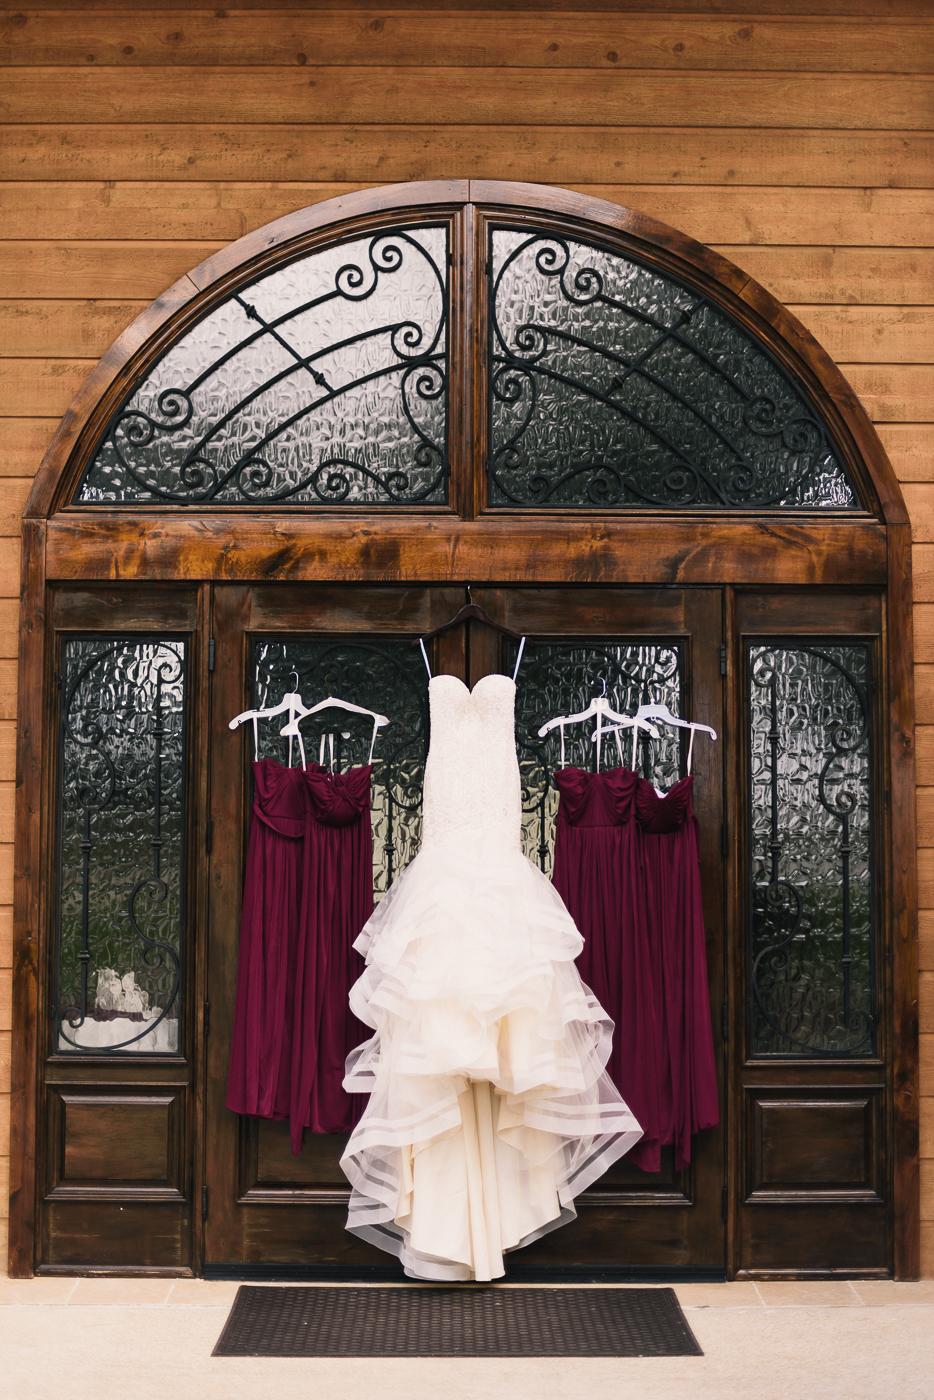 Gorgeous wedding dress wedding gown bridesmaid's dress maroon ornate door